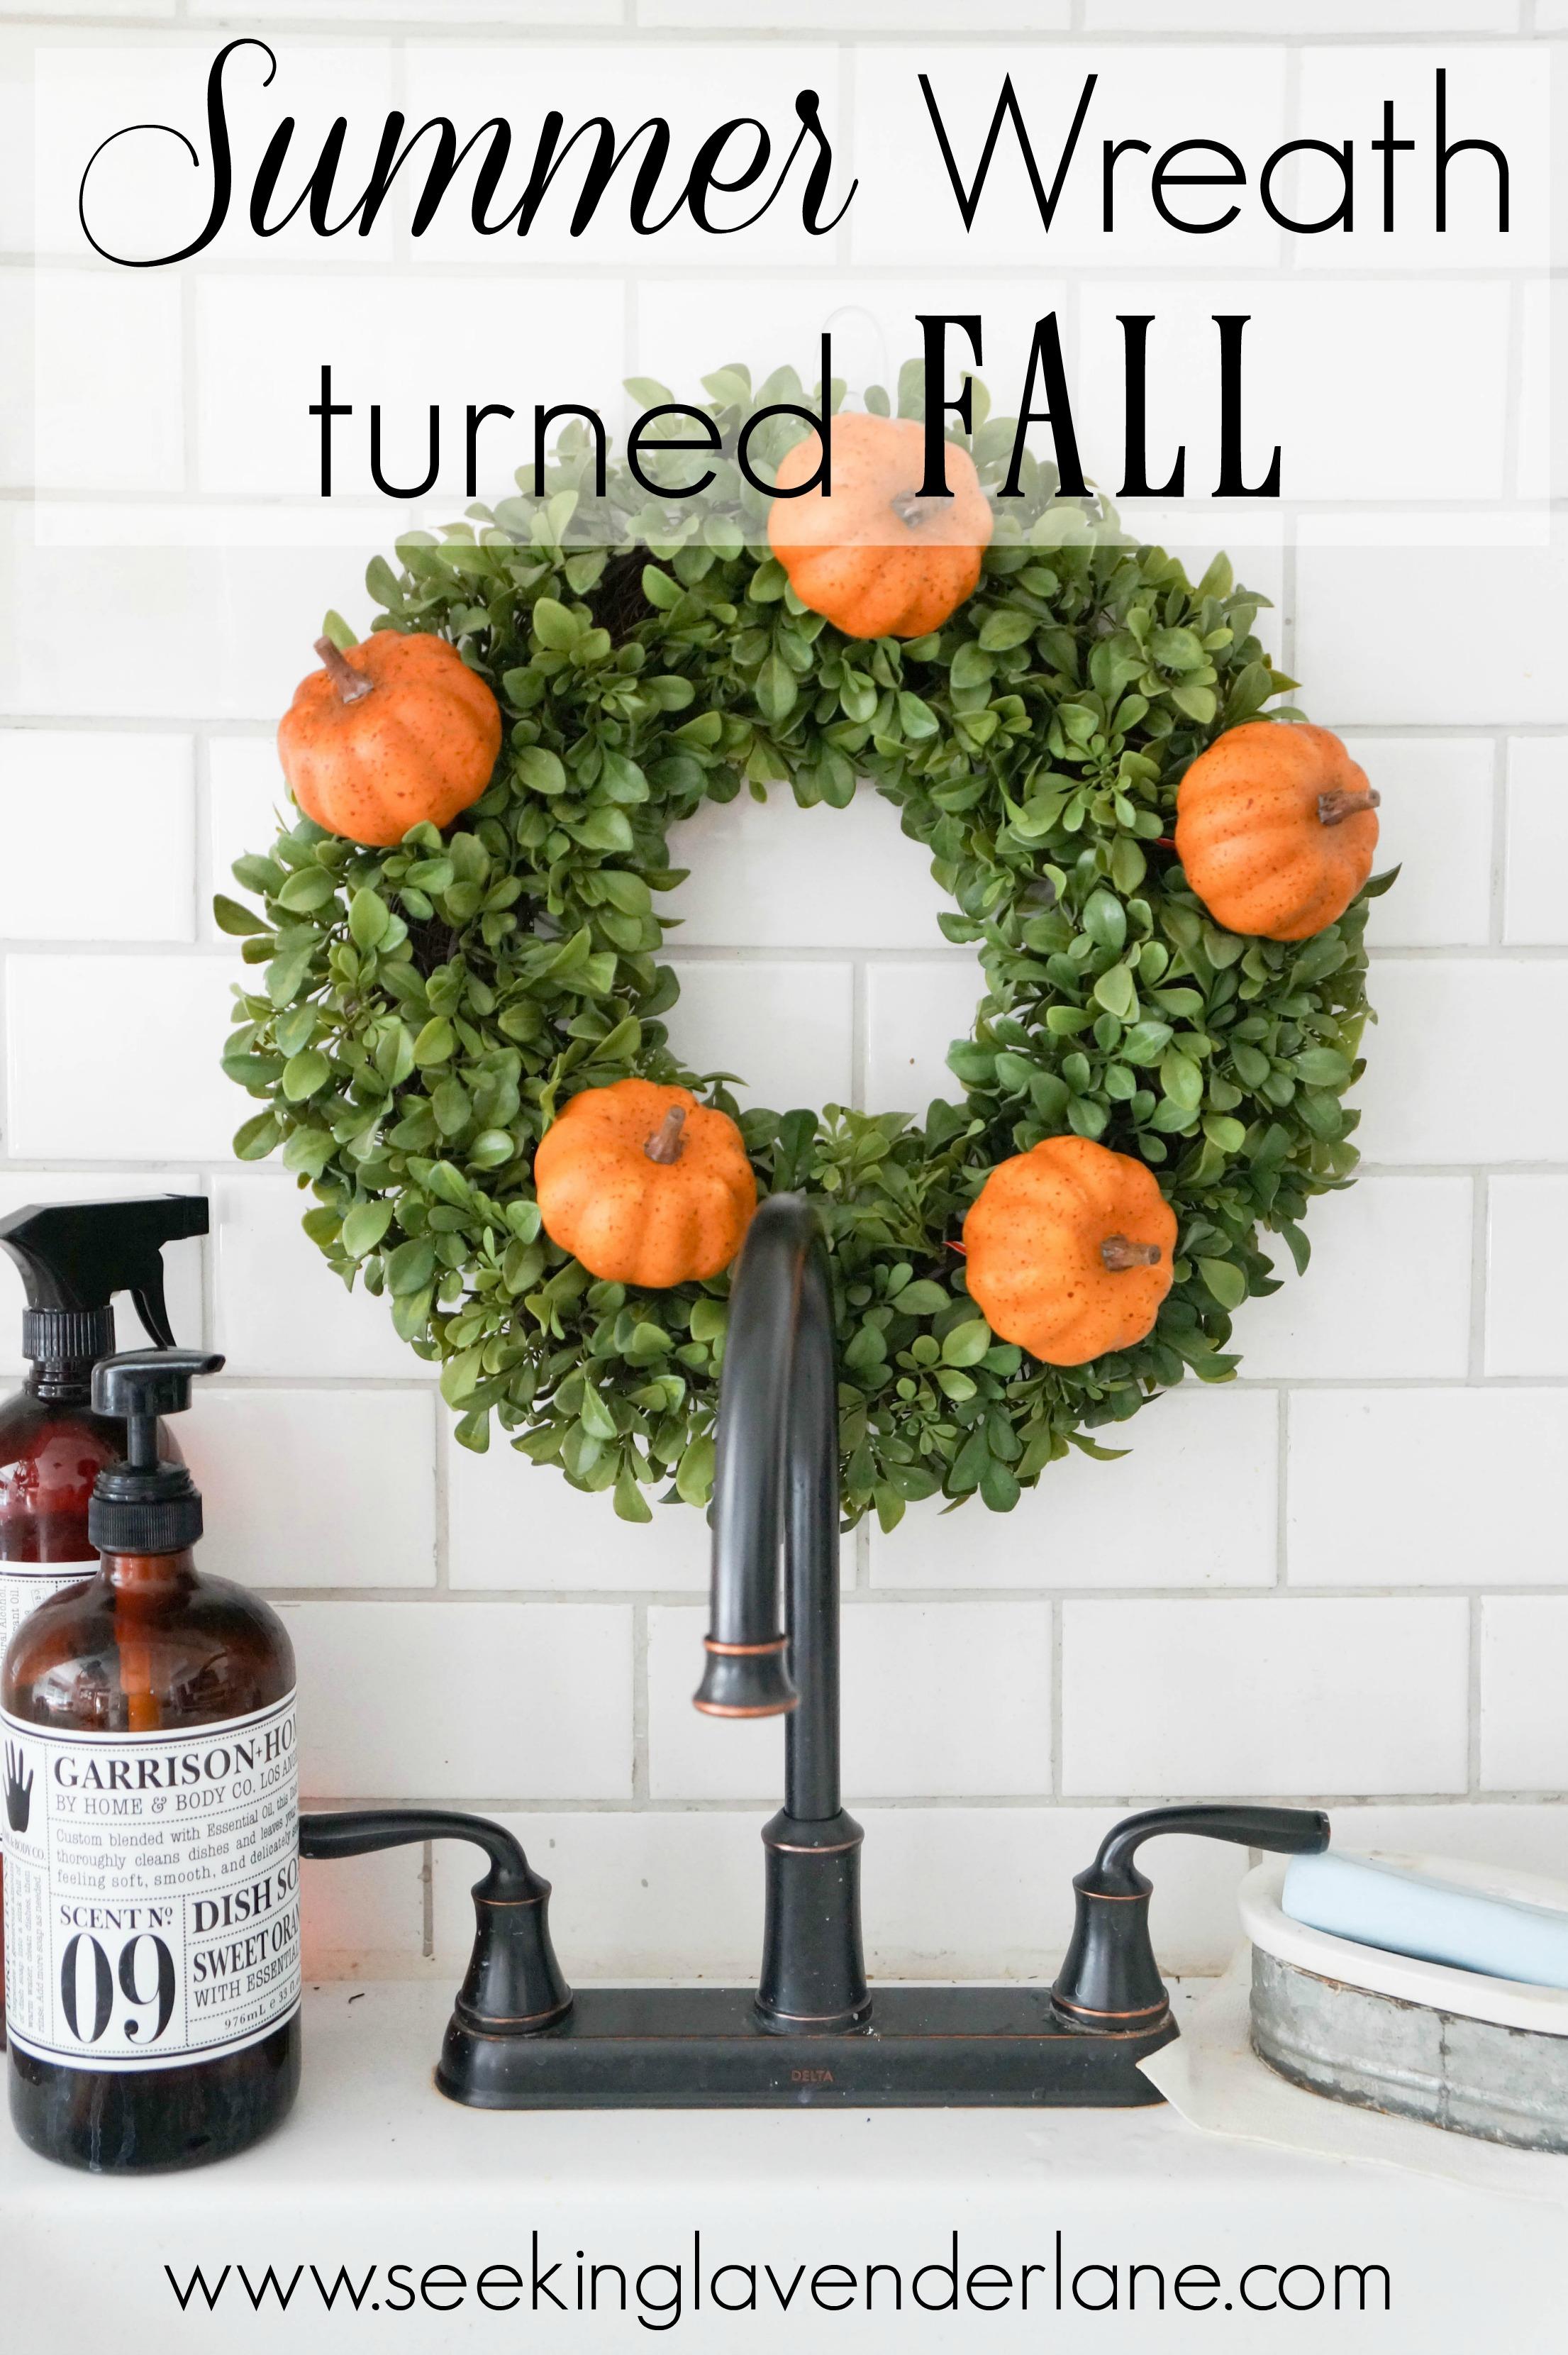 Summer Wreath Turned Fall-logo